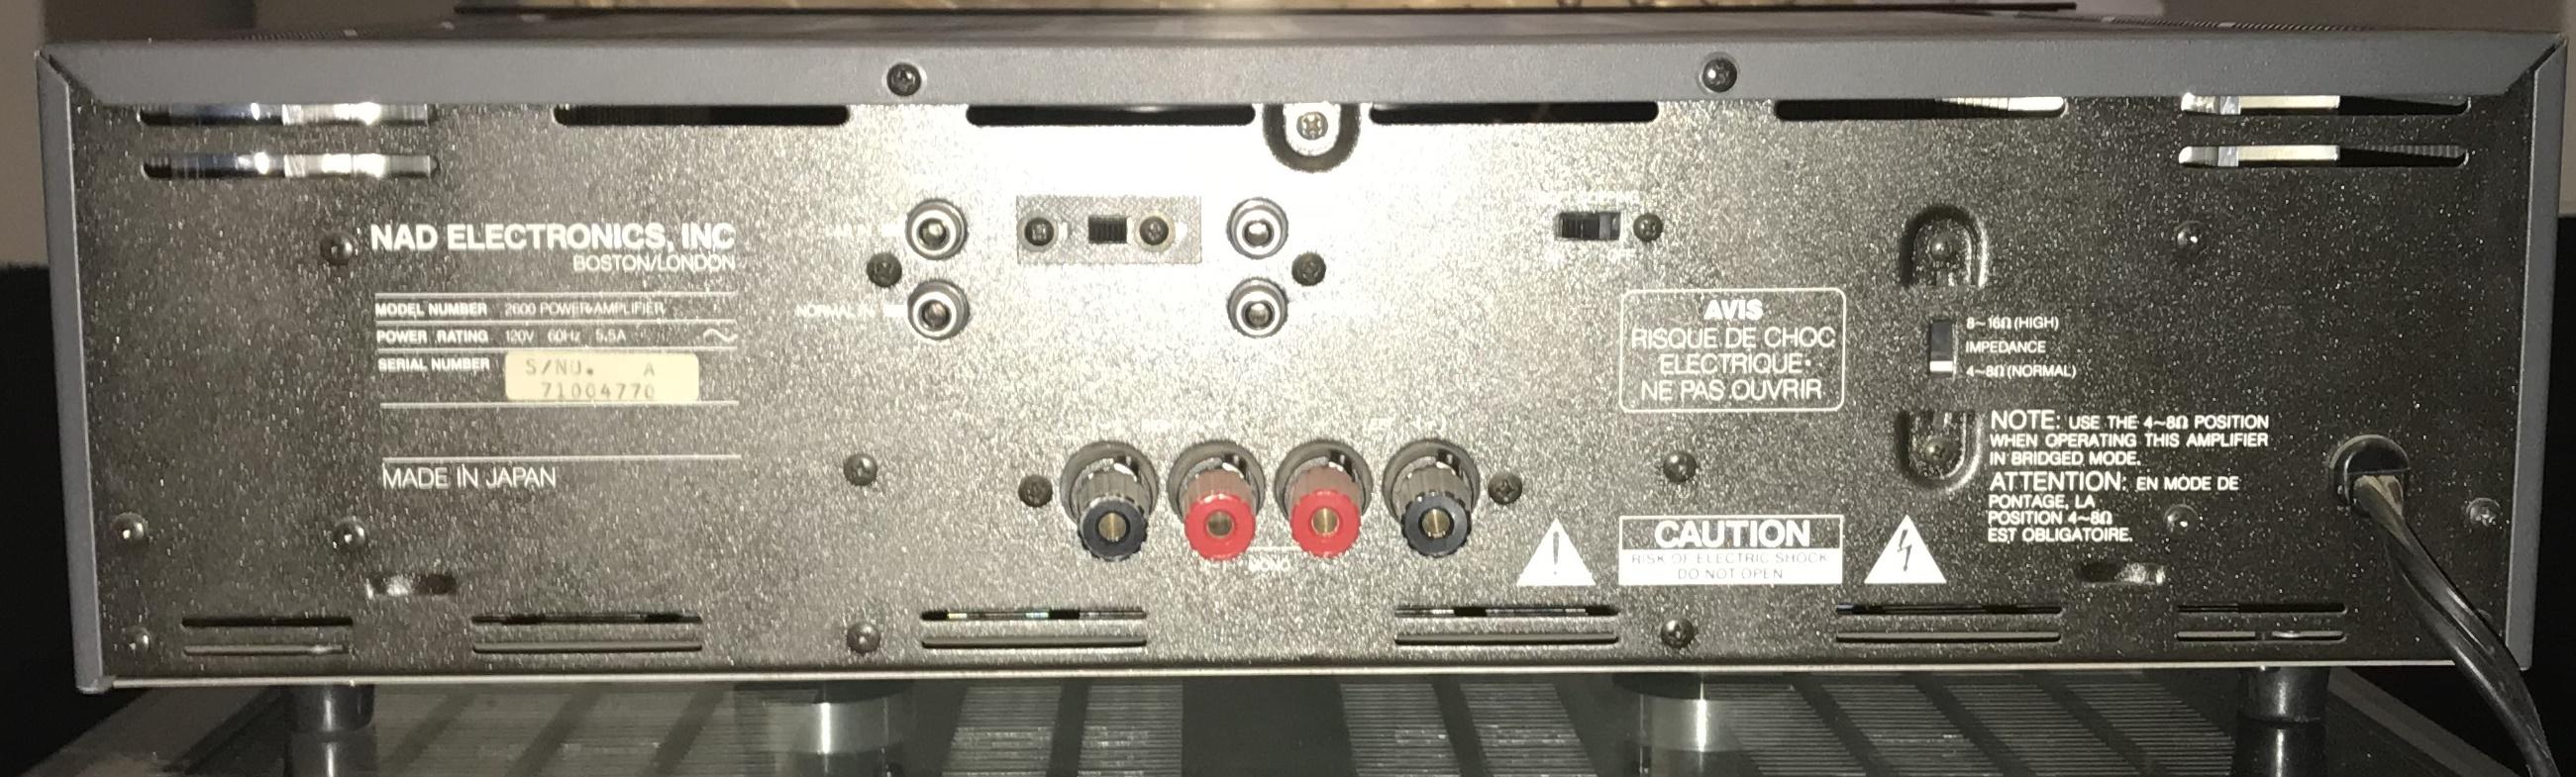 NAD_Power_Amp_2600_A_Back.jpg